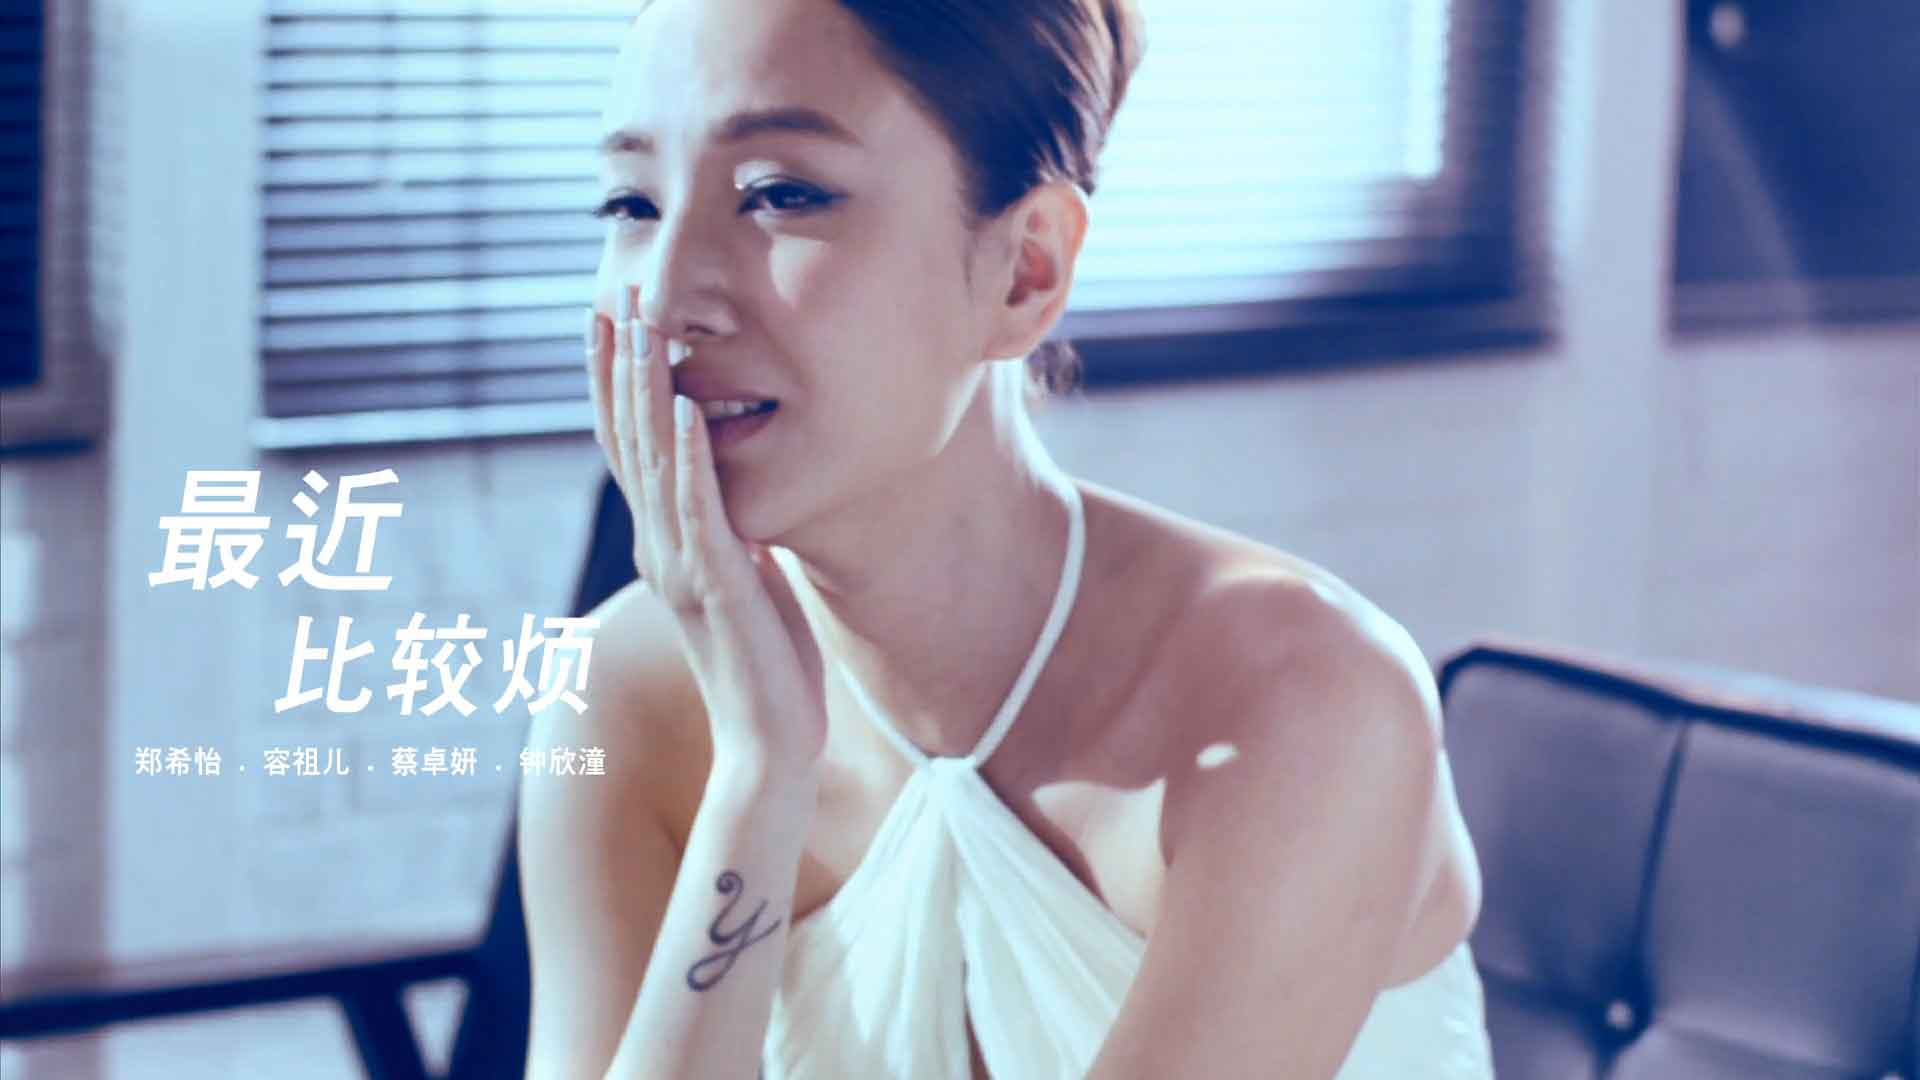 [1080P] 郑希怡&容祖儿&蔡卓妍&钟欣桐 - 最近比较烦 官方HD-MV